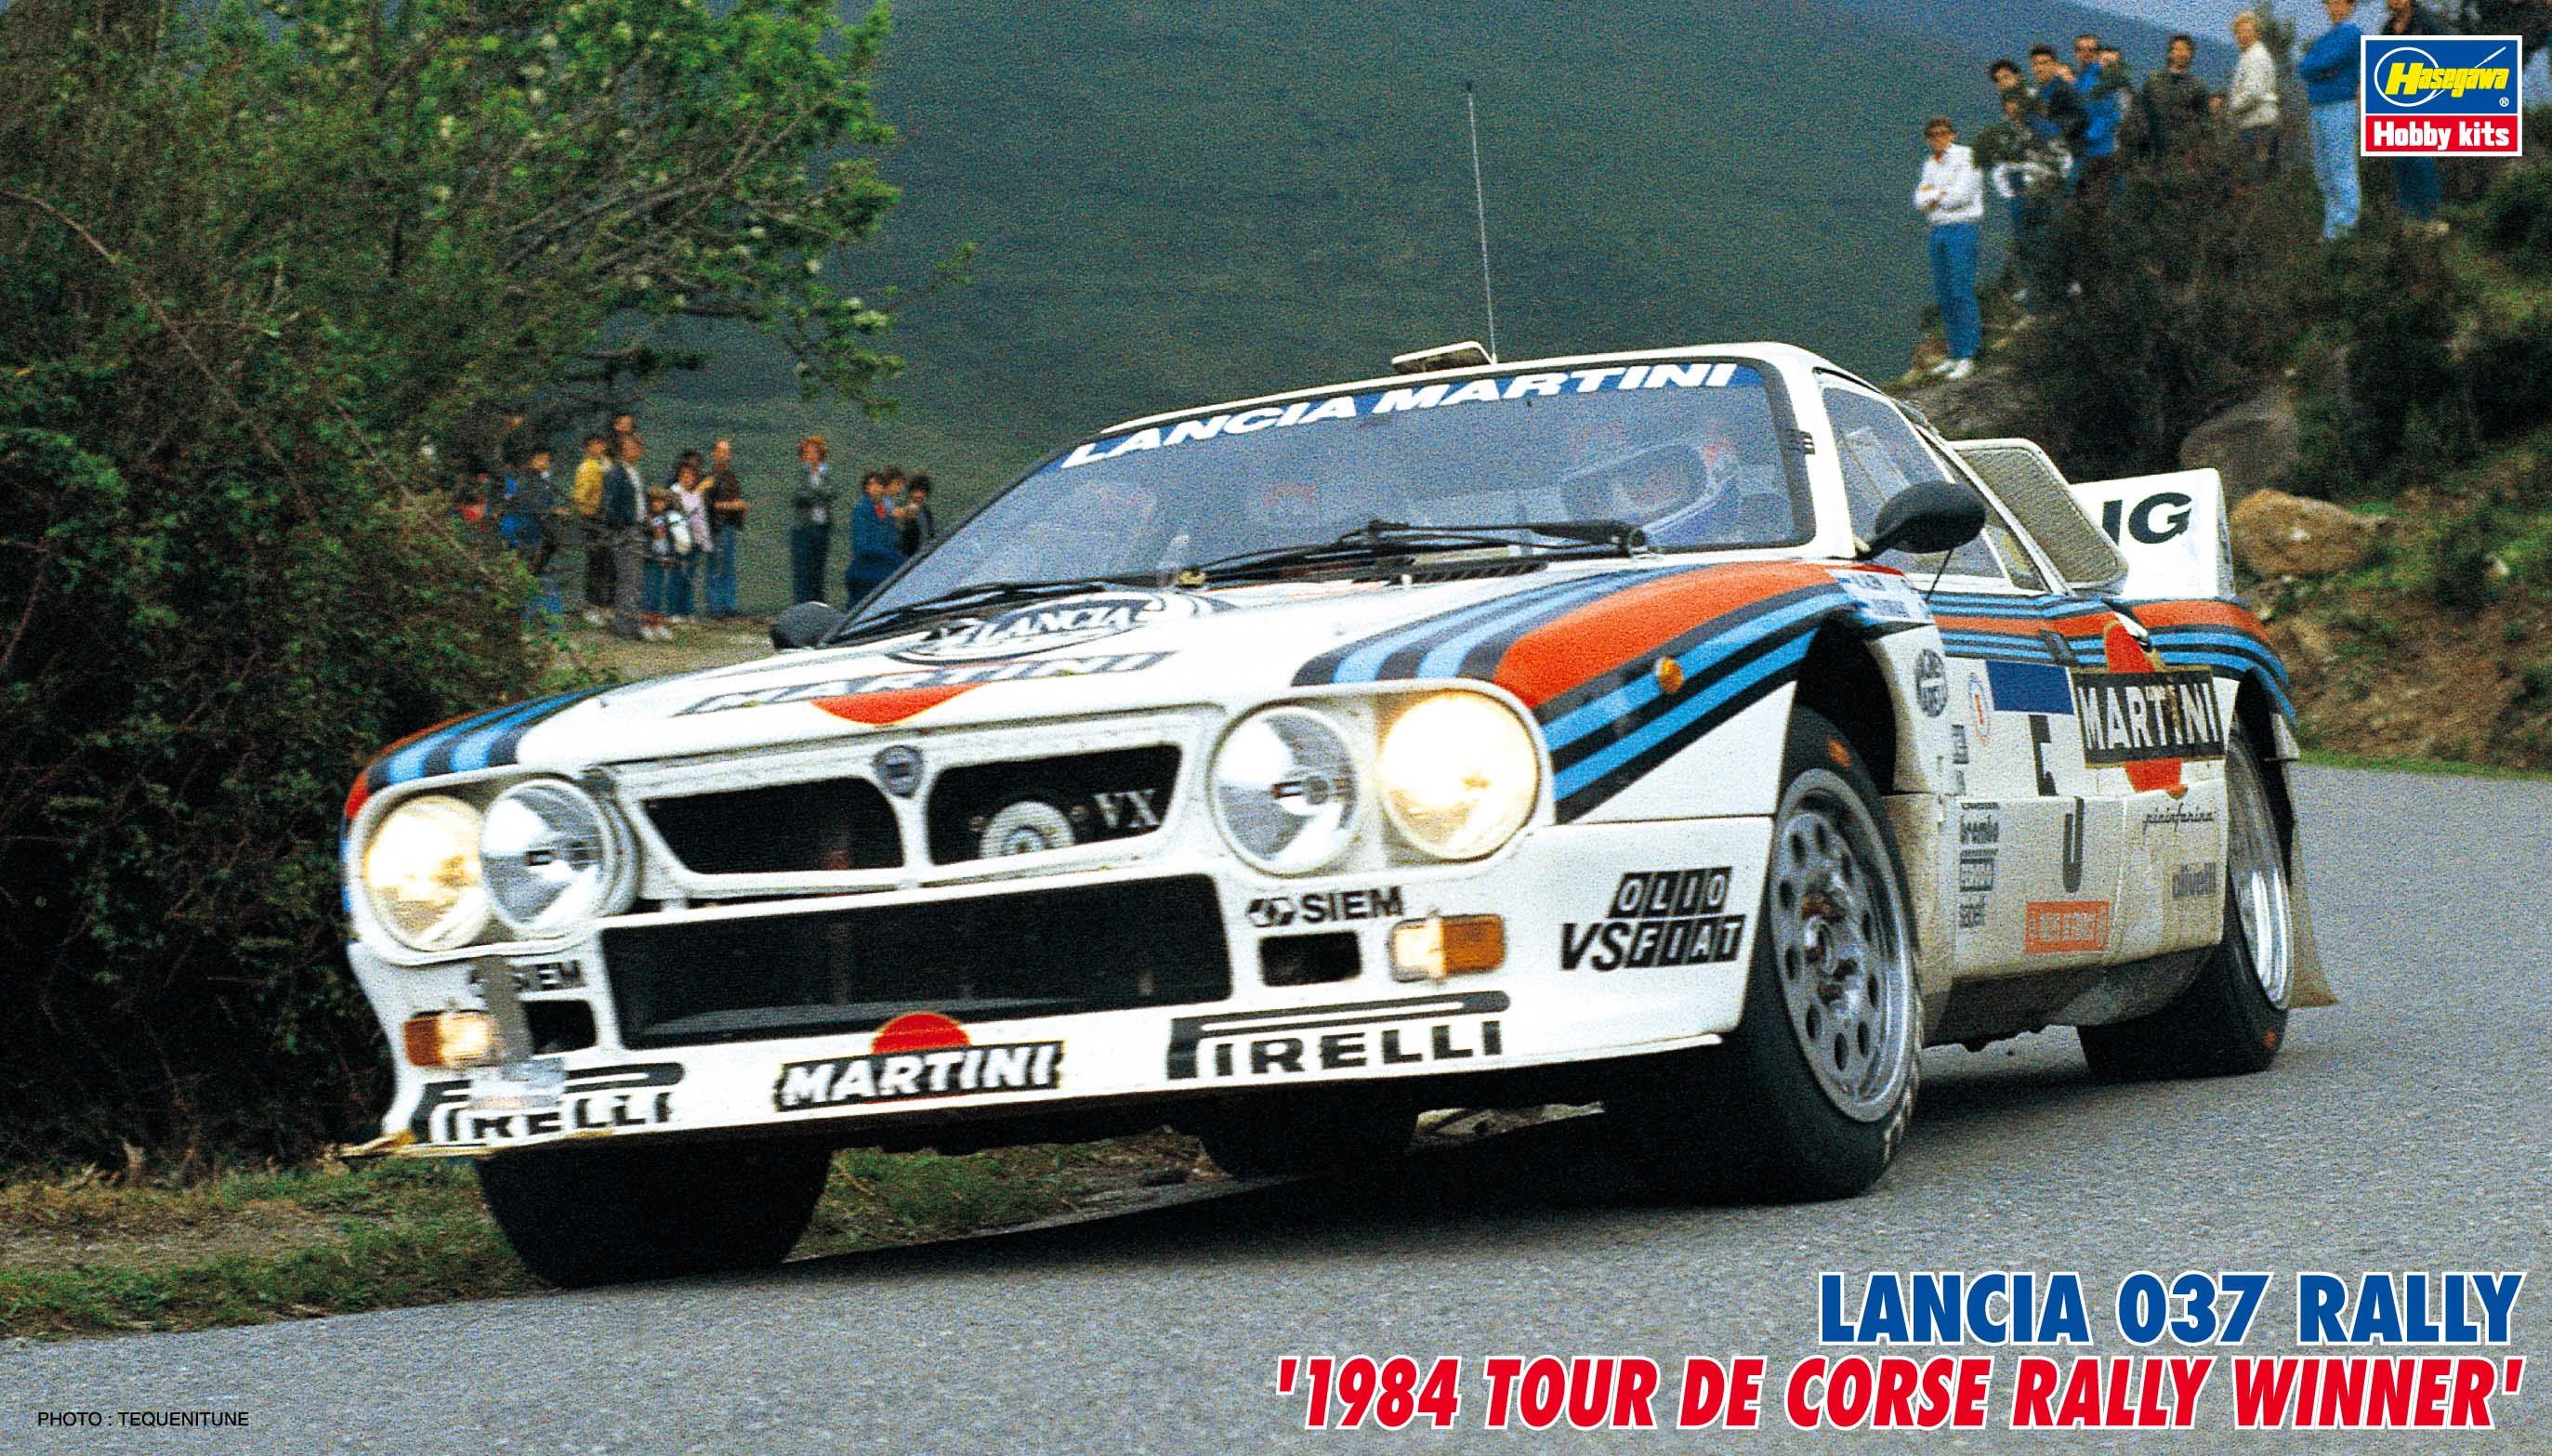 Hasegawa Lancia 037 Rally ('84 Tour De Corse Rally Winner) CR30